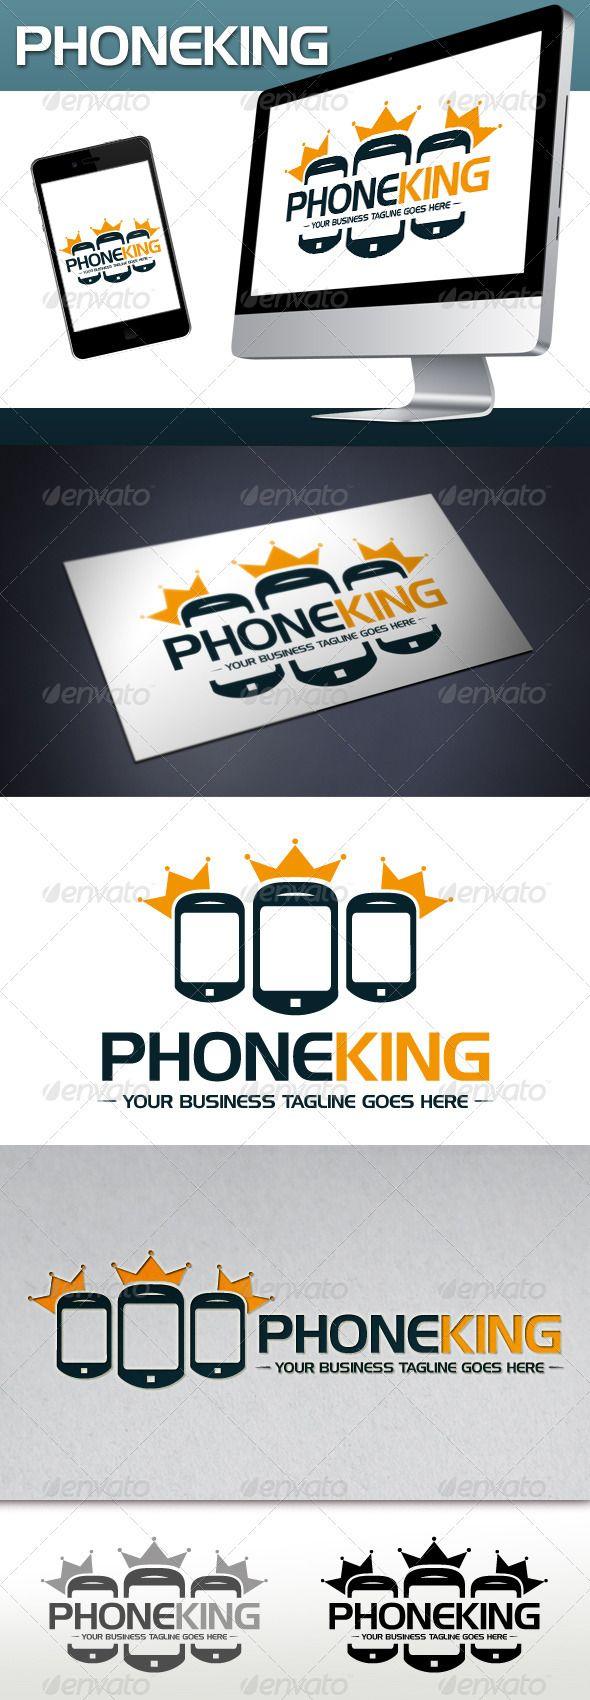 46 best logo images on Pinterest | Logo templates, Background images ...